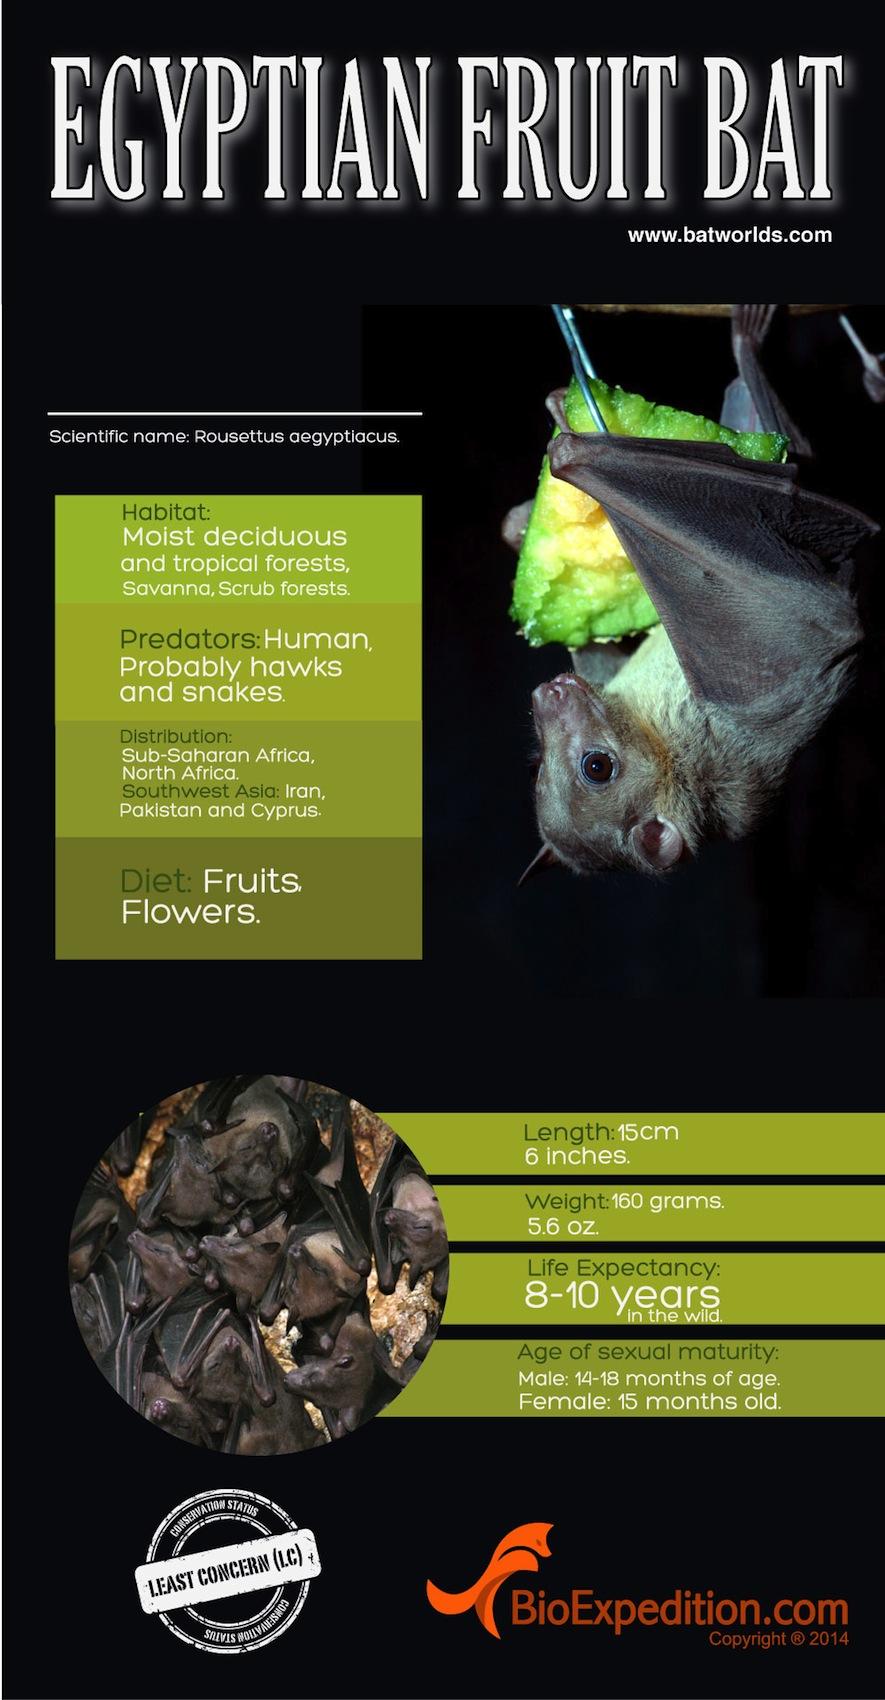 Egyptian_Fruit_bat 1700